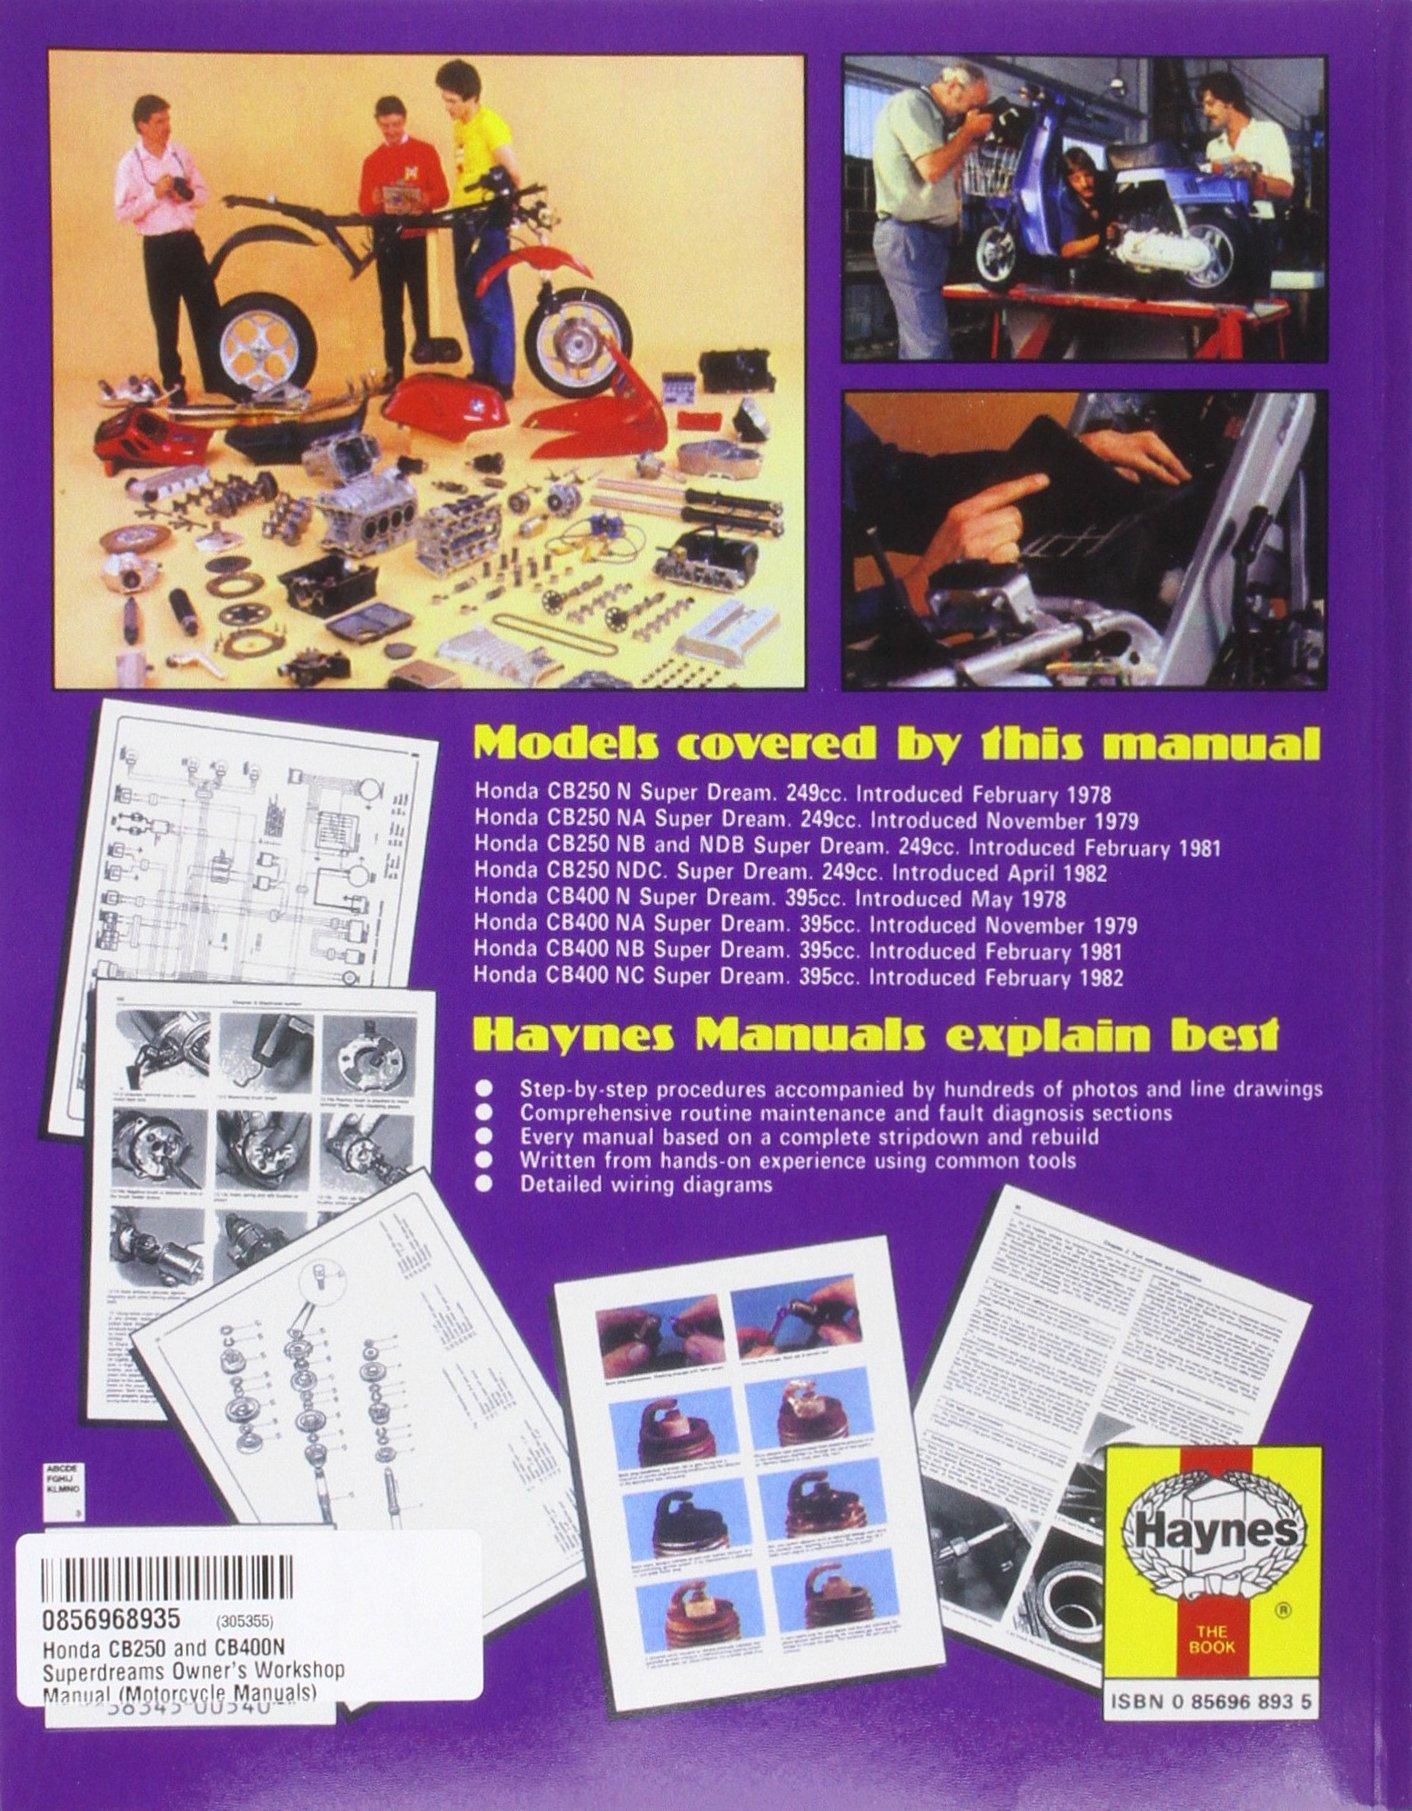 Honda Cb250 Cb400n Super Dreams 78 84 Motorcycle Manuals Wiring Diagram Haynes Publishing 9780856968938 Books